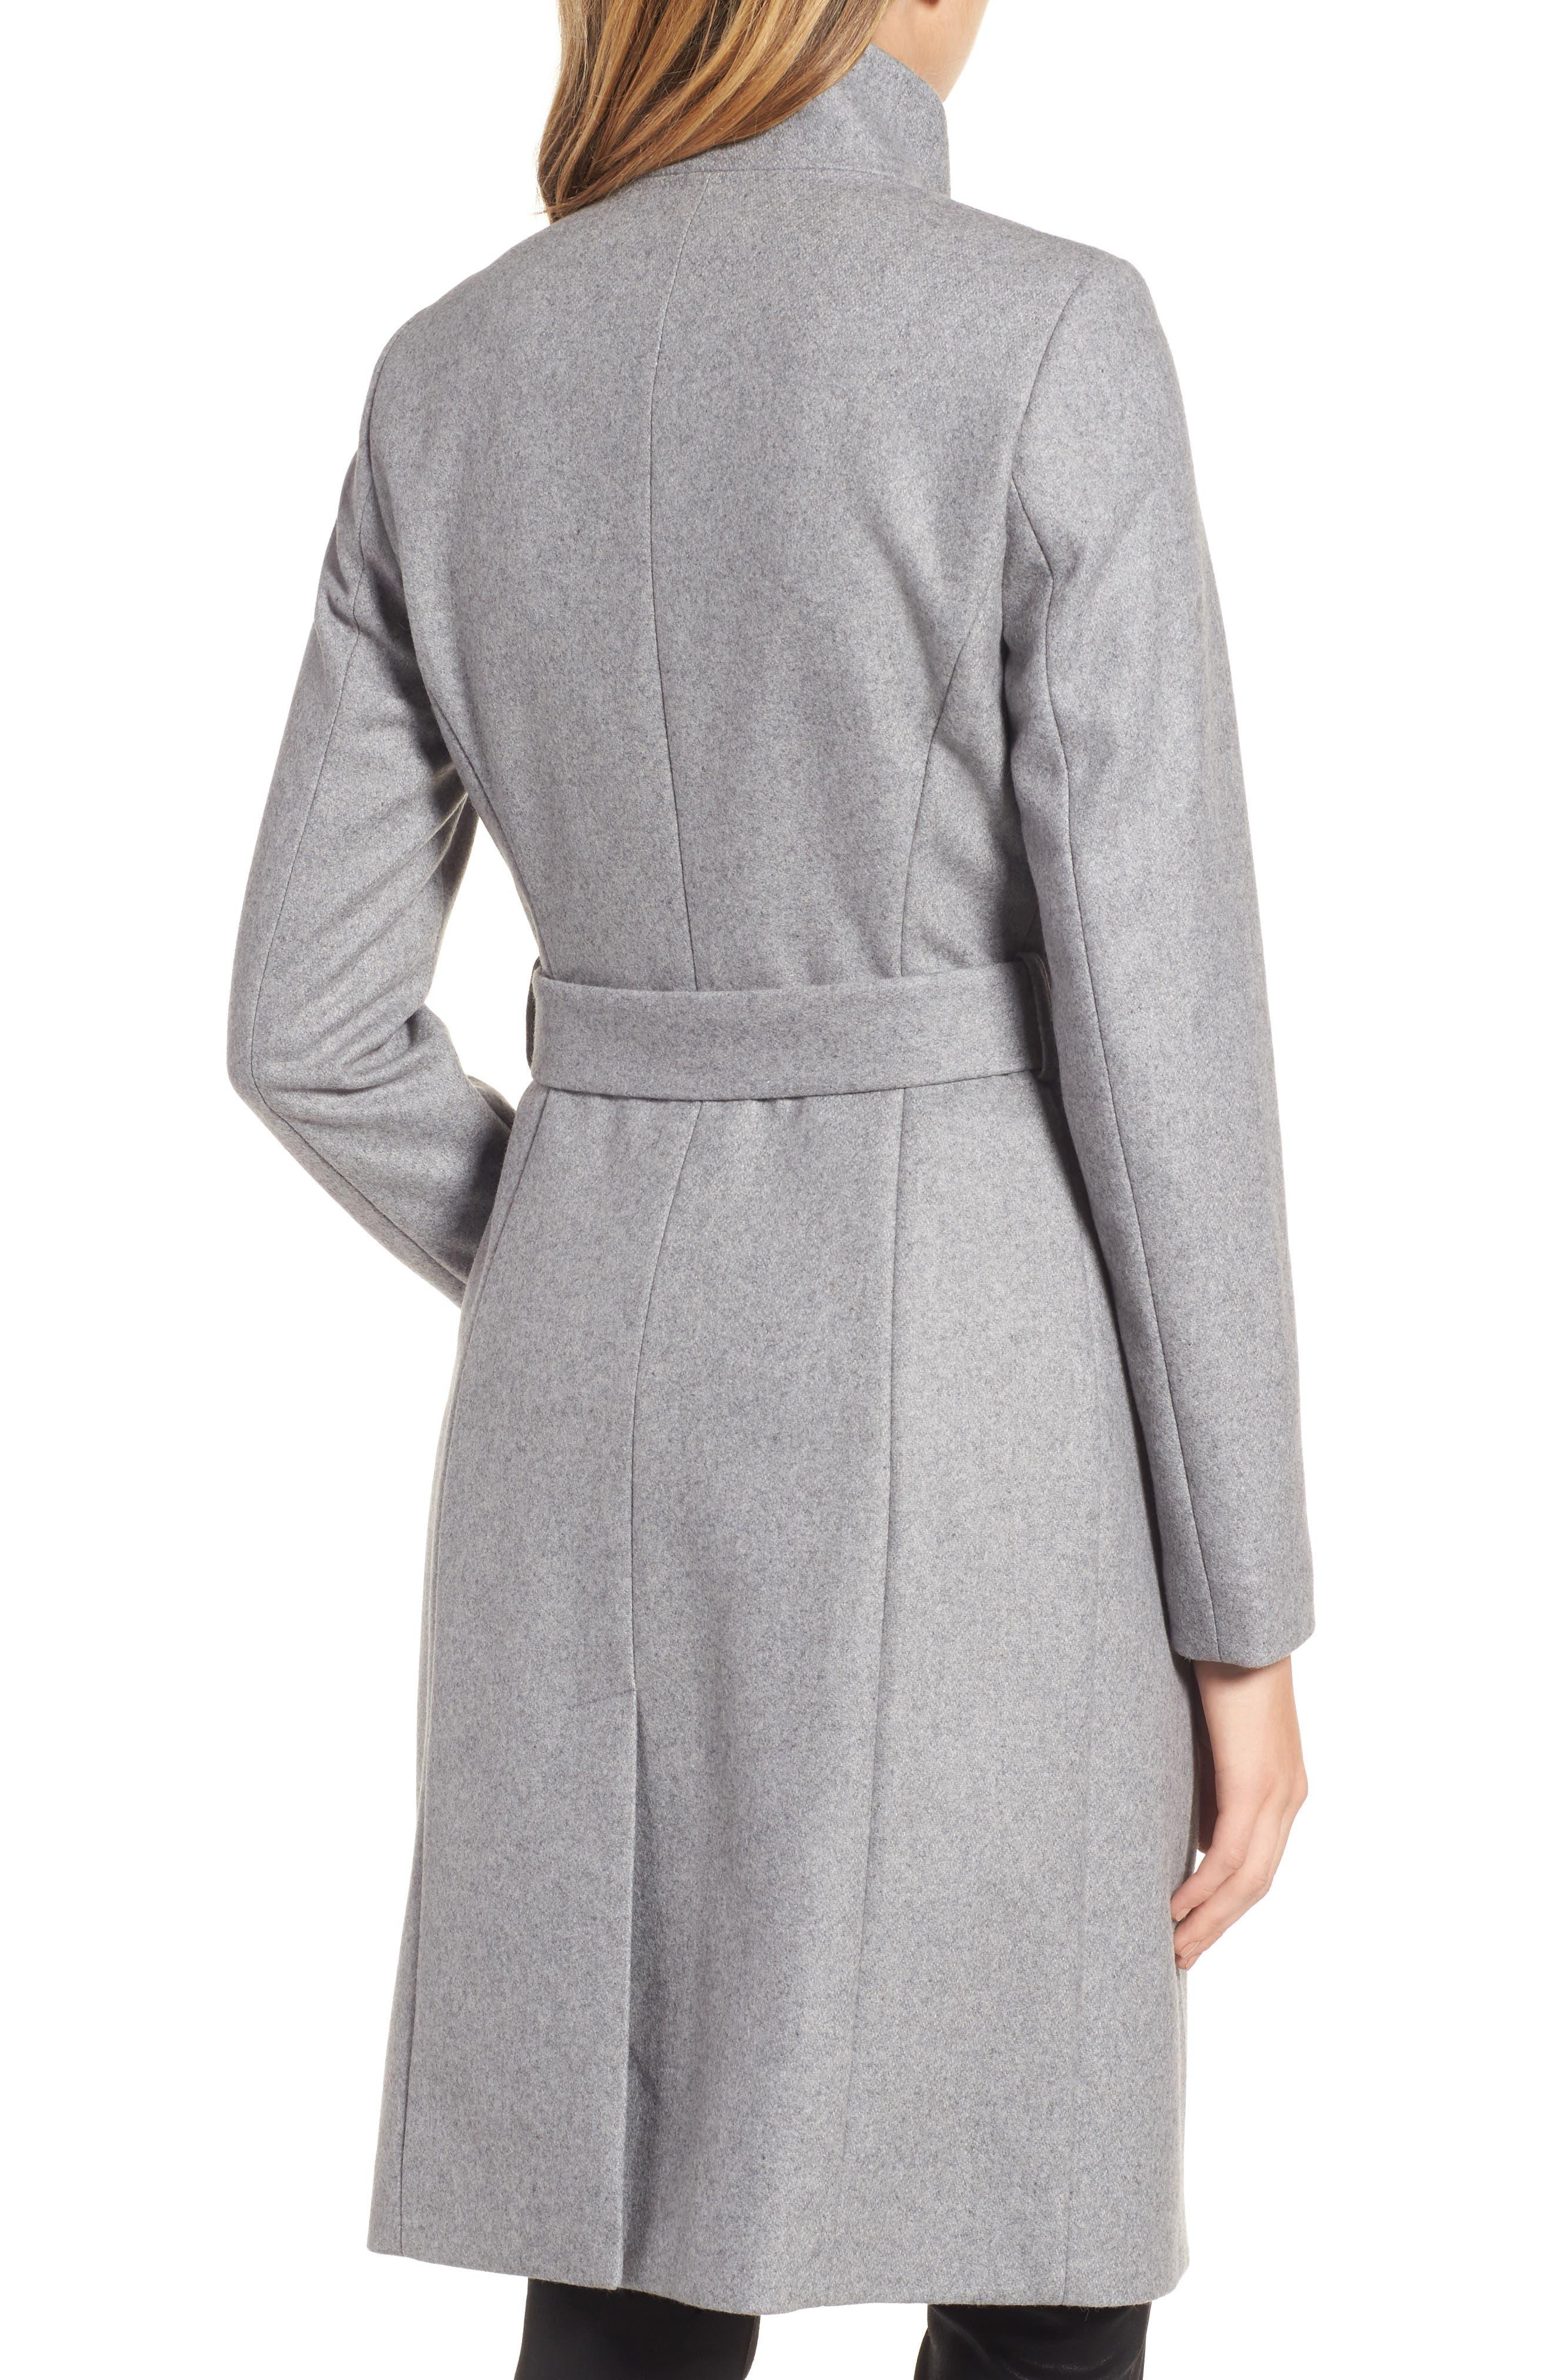 Wool Blend Long Wrap Coat,                             Alternate thumbnail 2, color,                             050